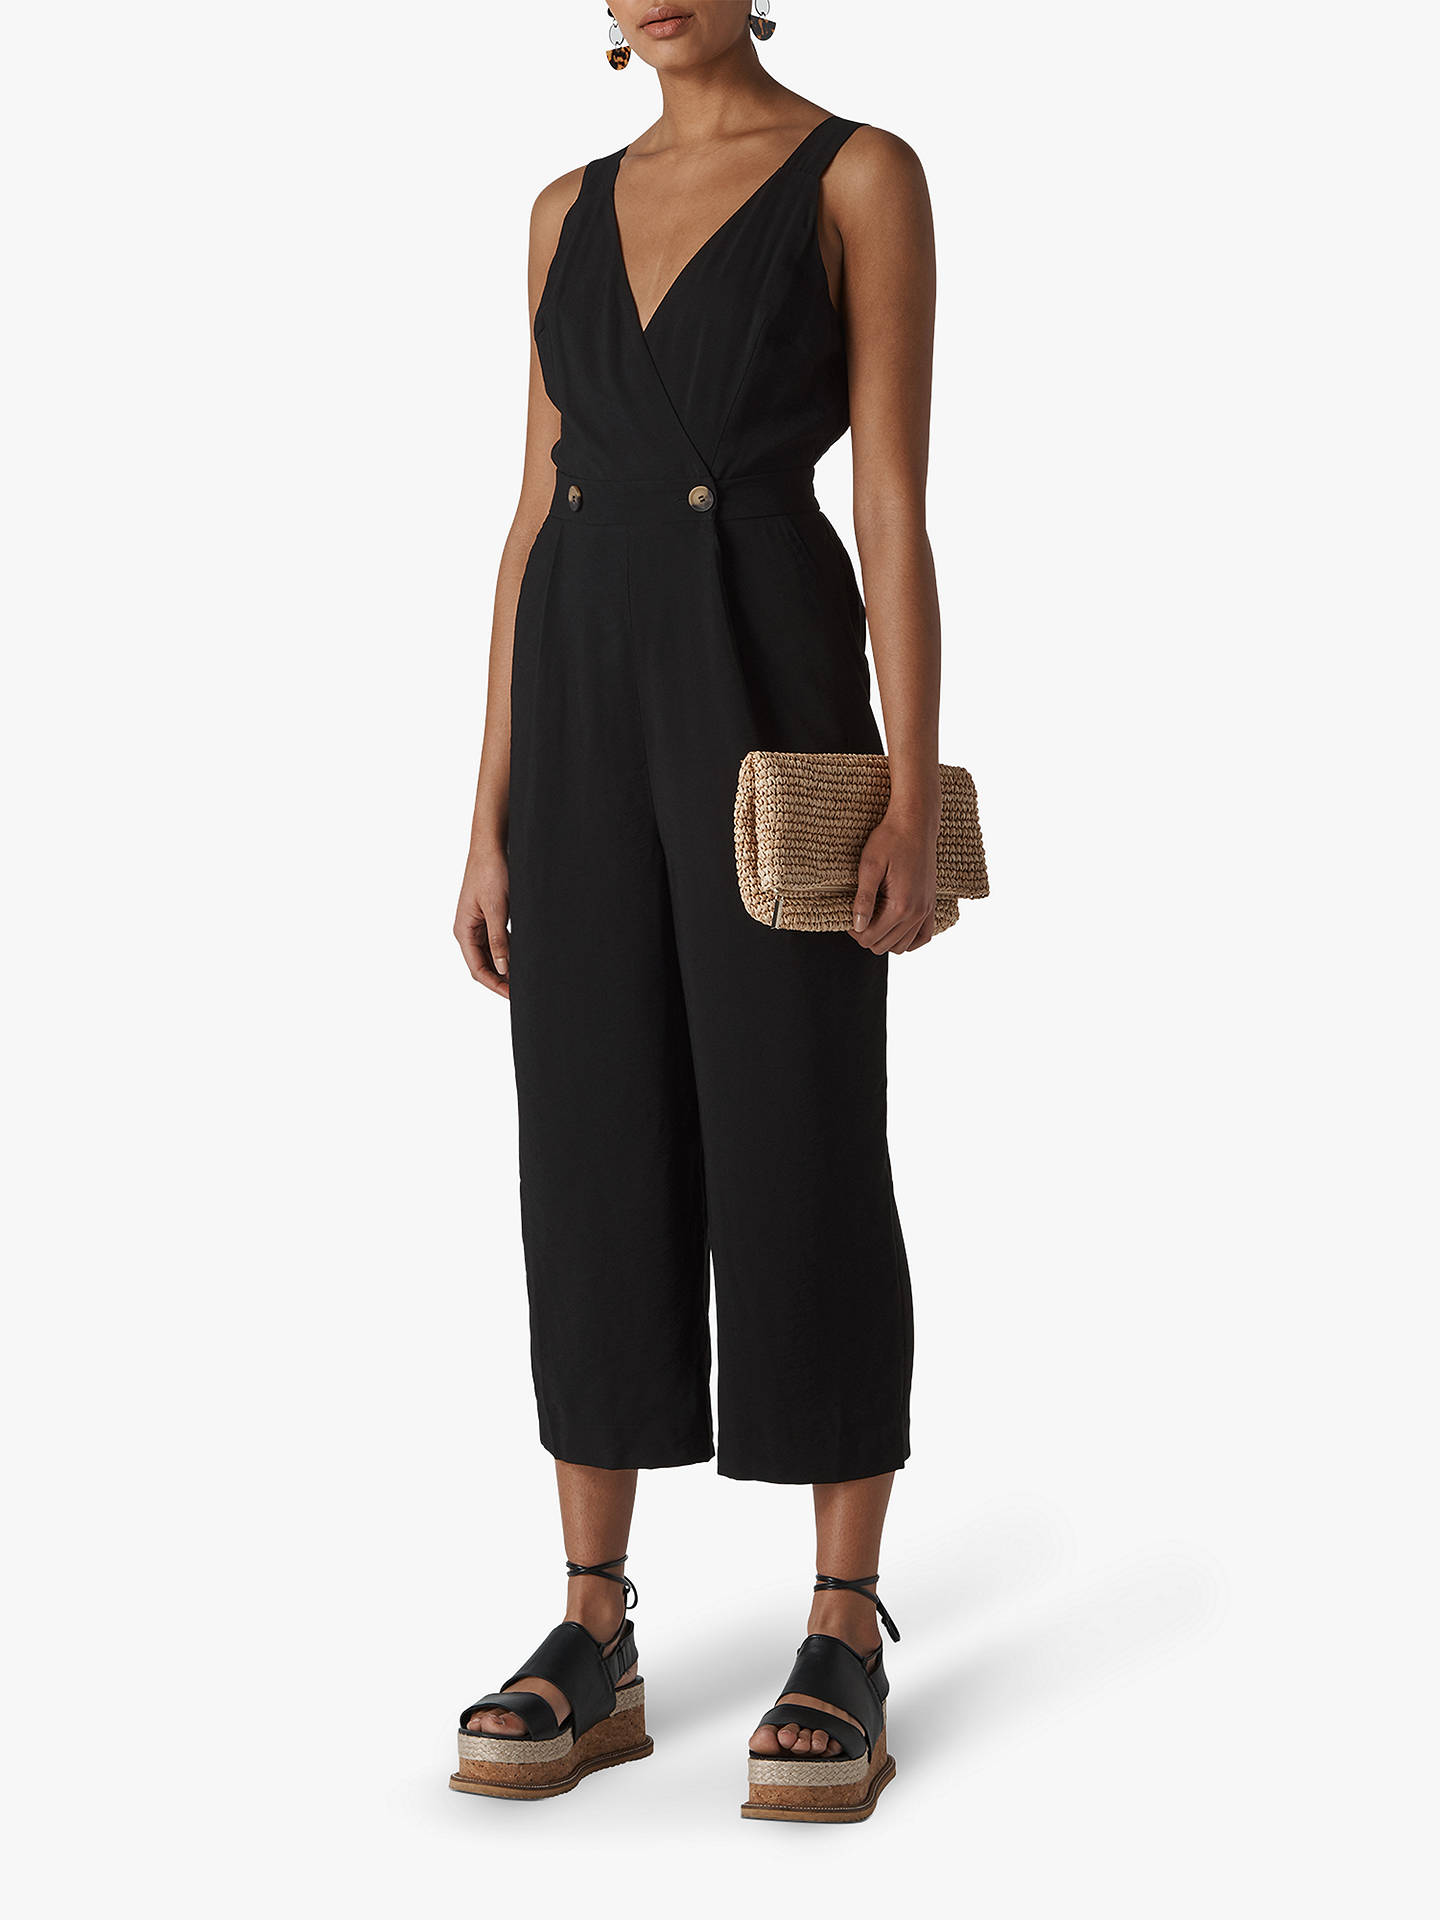 wholesale online rich and magnificent online sale Whistles Lara Jumpsuit, Black at John Lewis & Partners